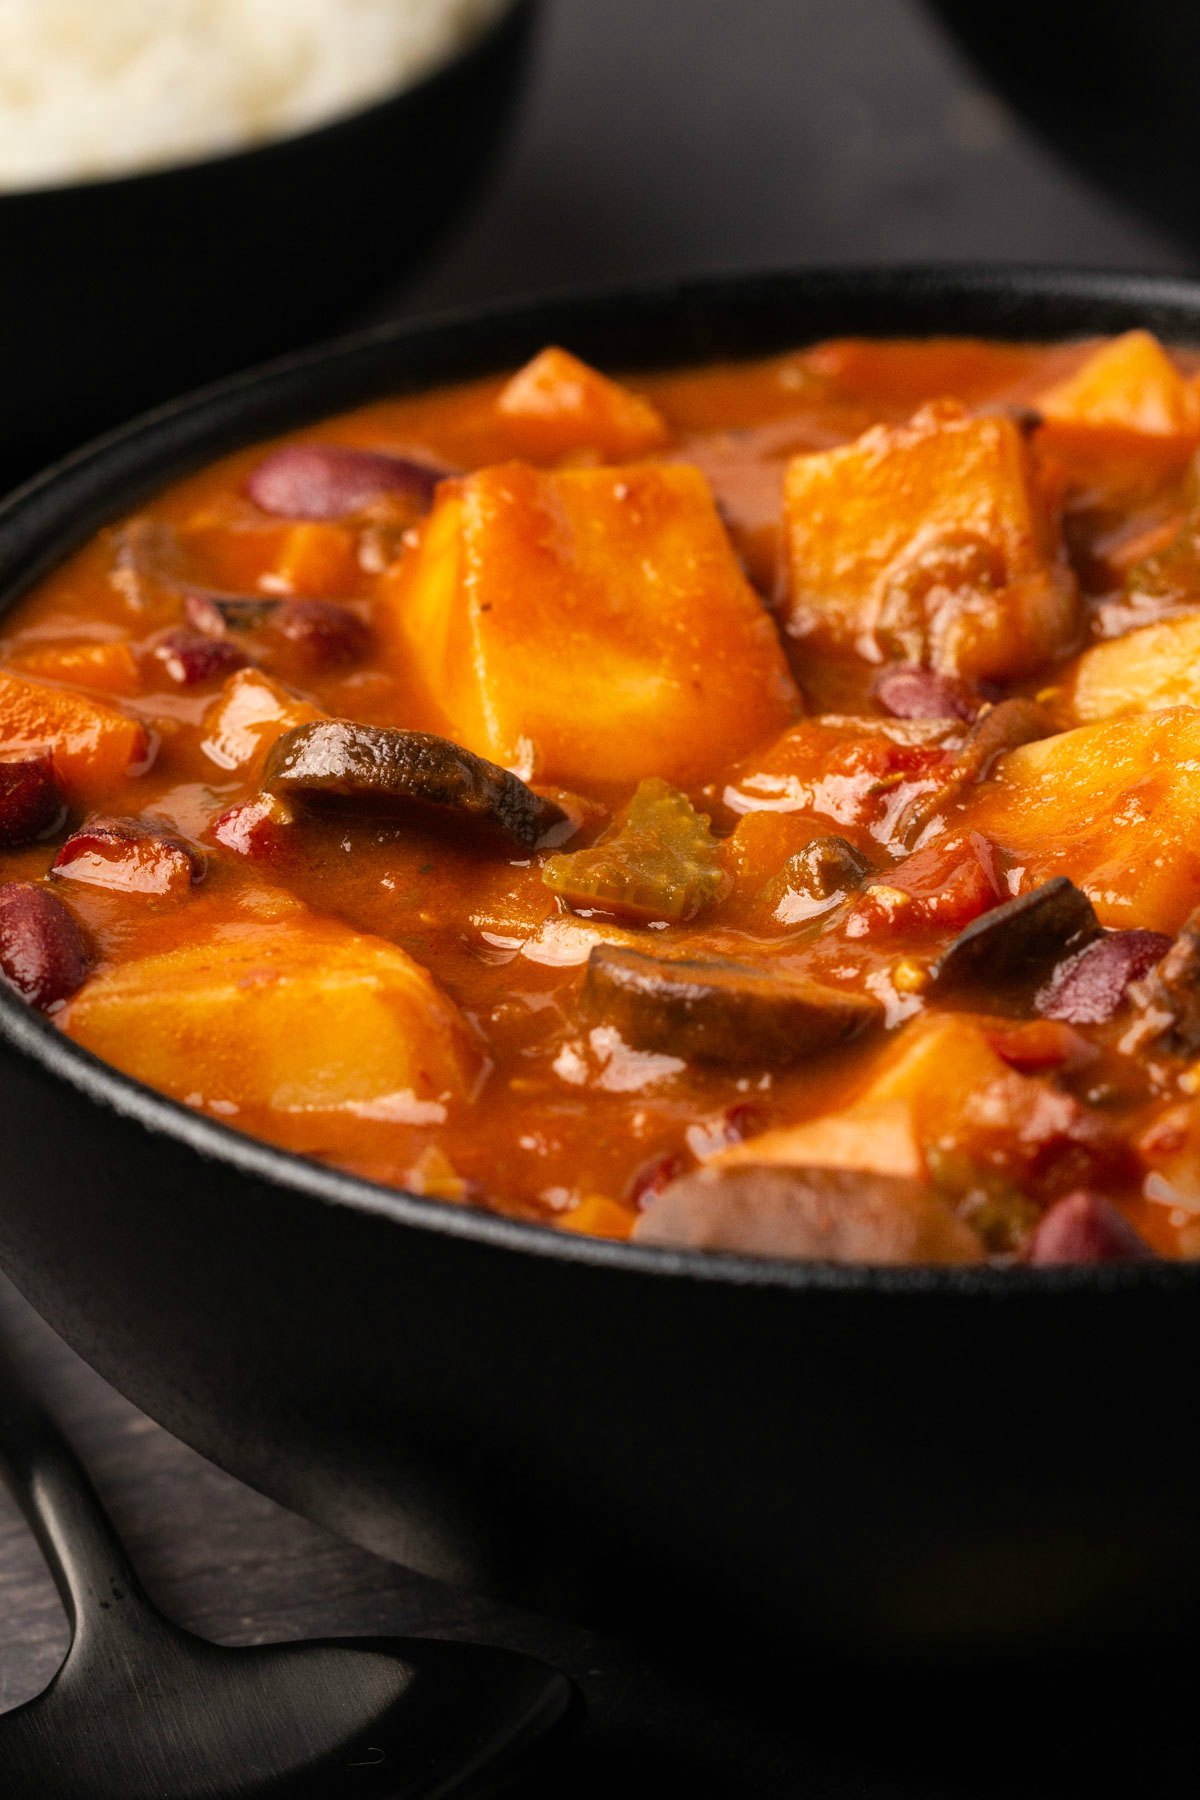 Vegan stew served in a black bowl.